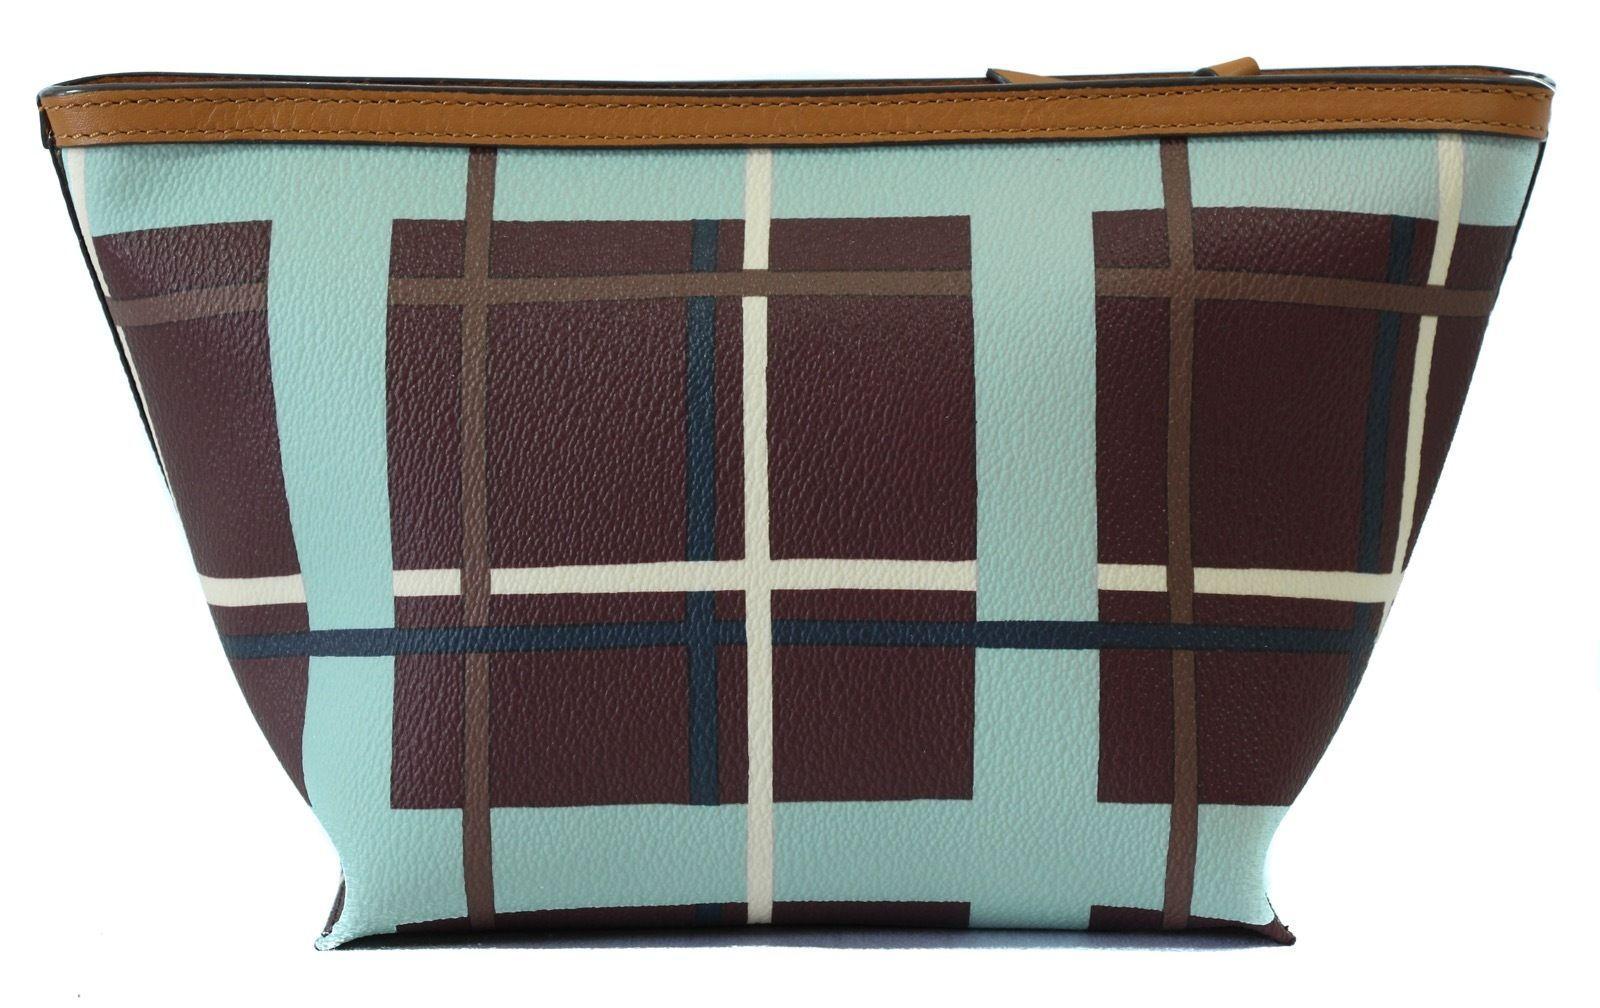 NIB Tory Burch Beach Kerrington Triangle Cosmetic Case Bag